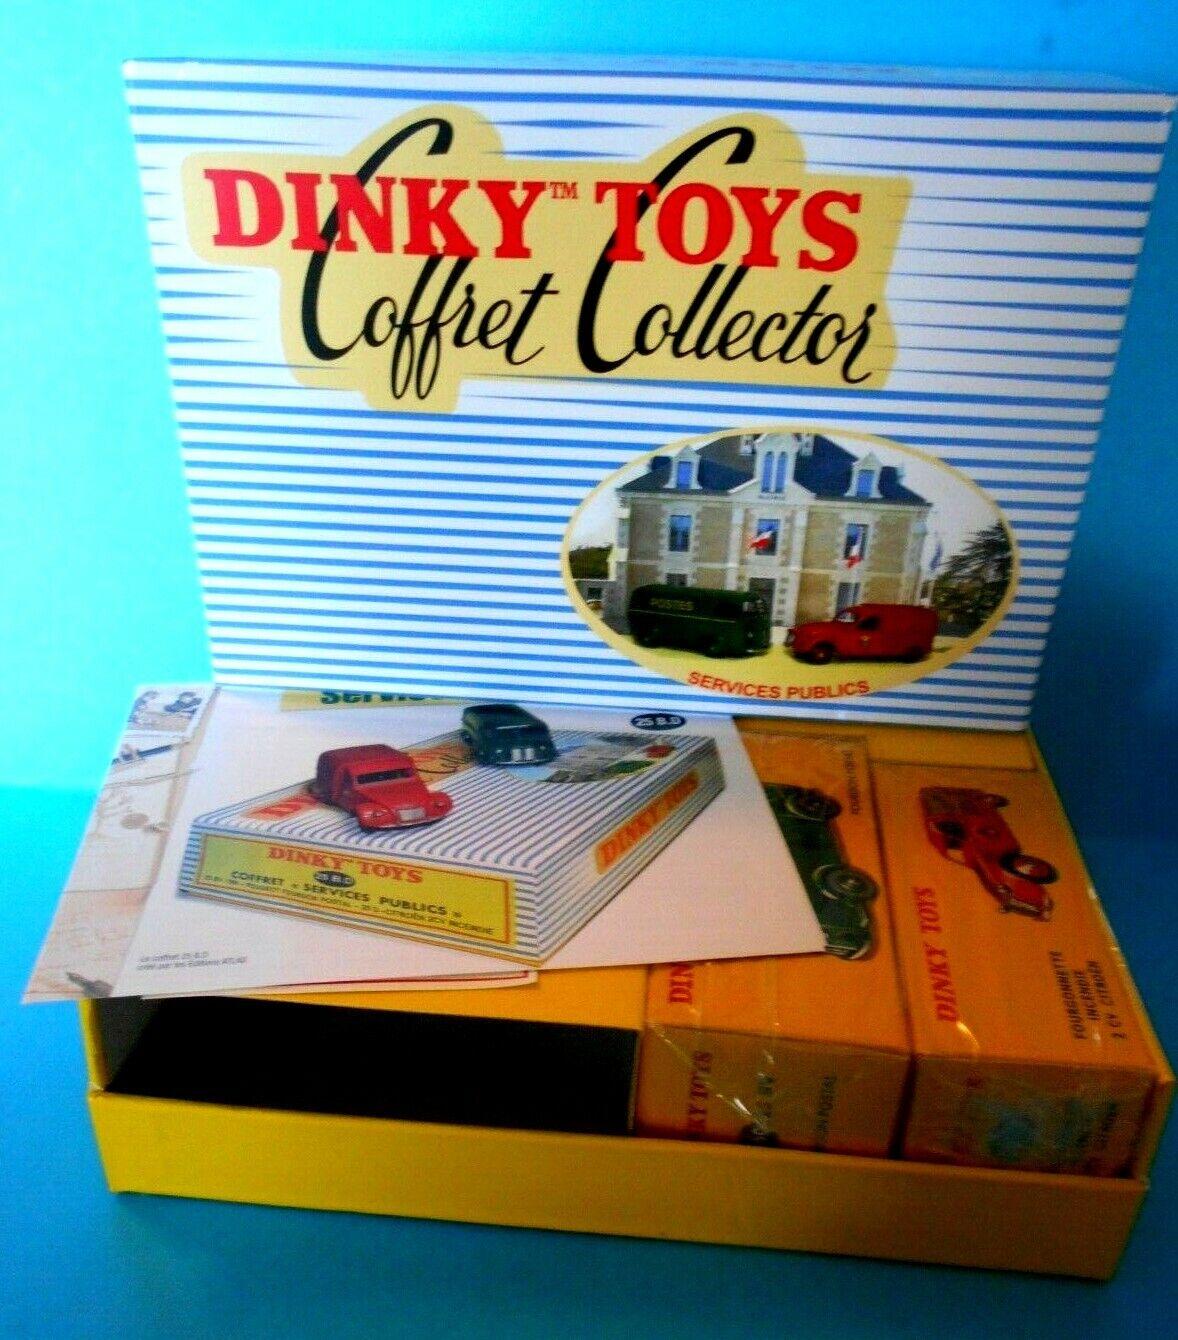 DINKY JUGUETES COFFRET COFFRET COFFRET SERVICE PUBLIC 520 2083520 ATLAS EDICIONES 1 43 [N] 12703e